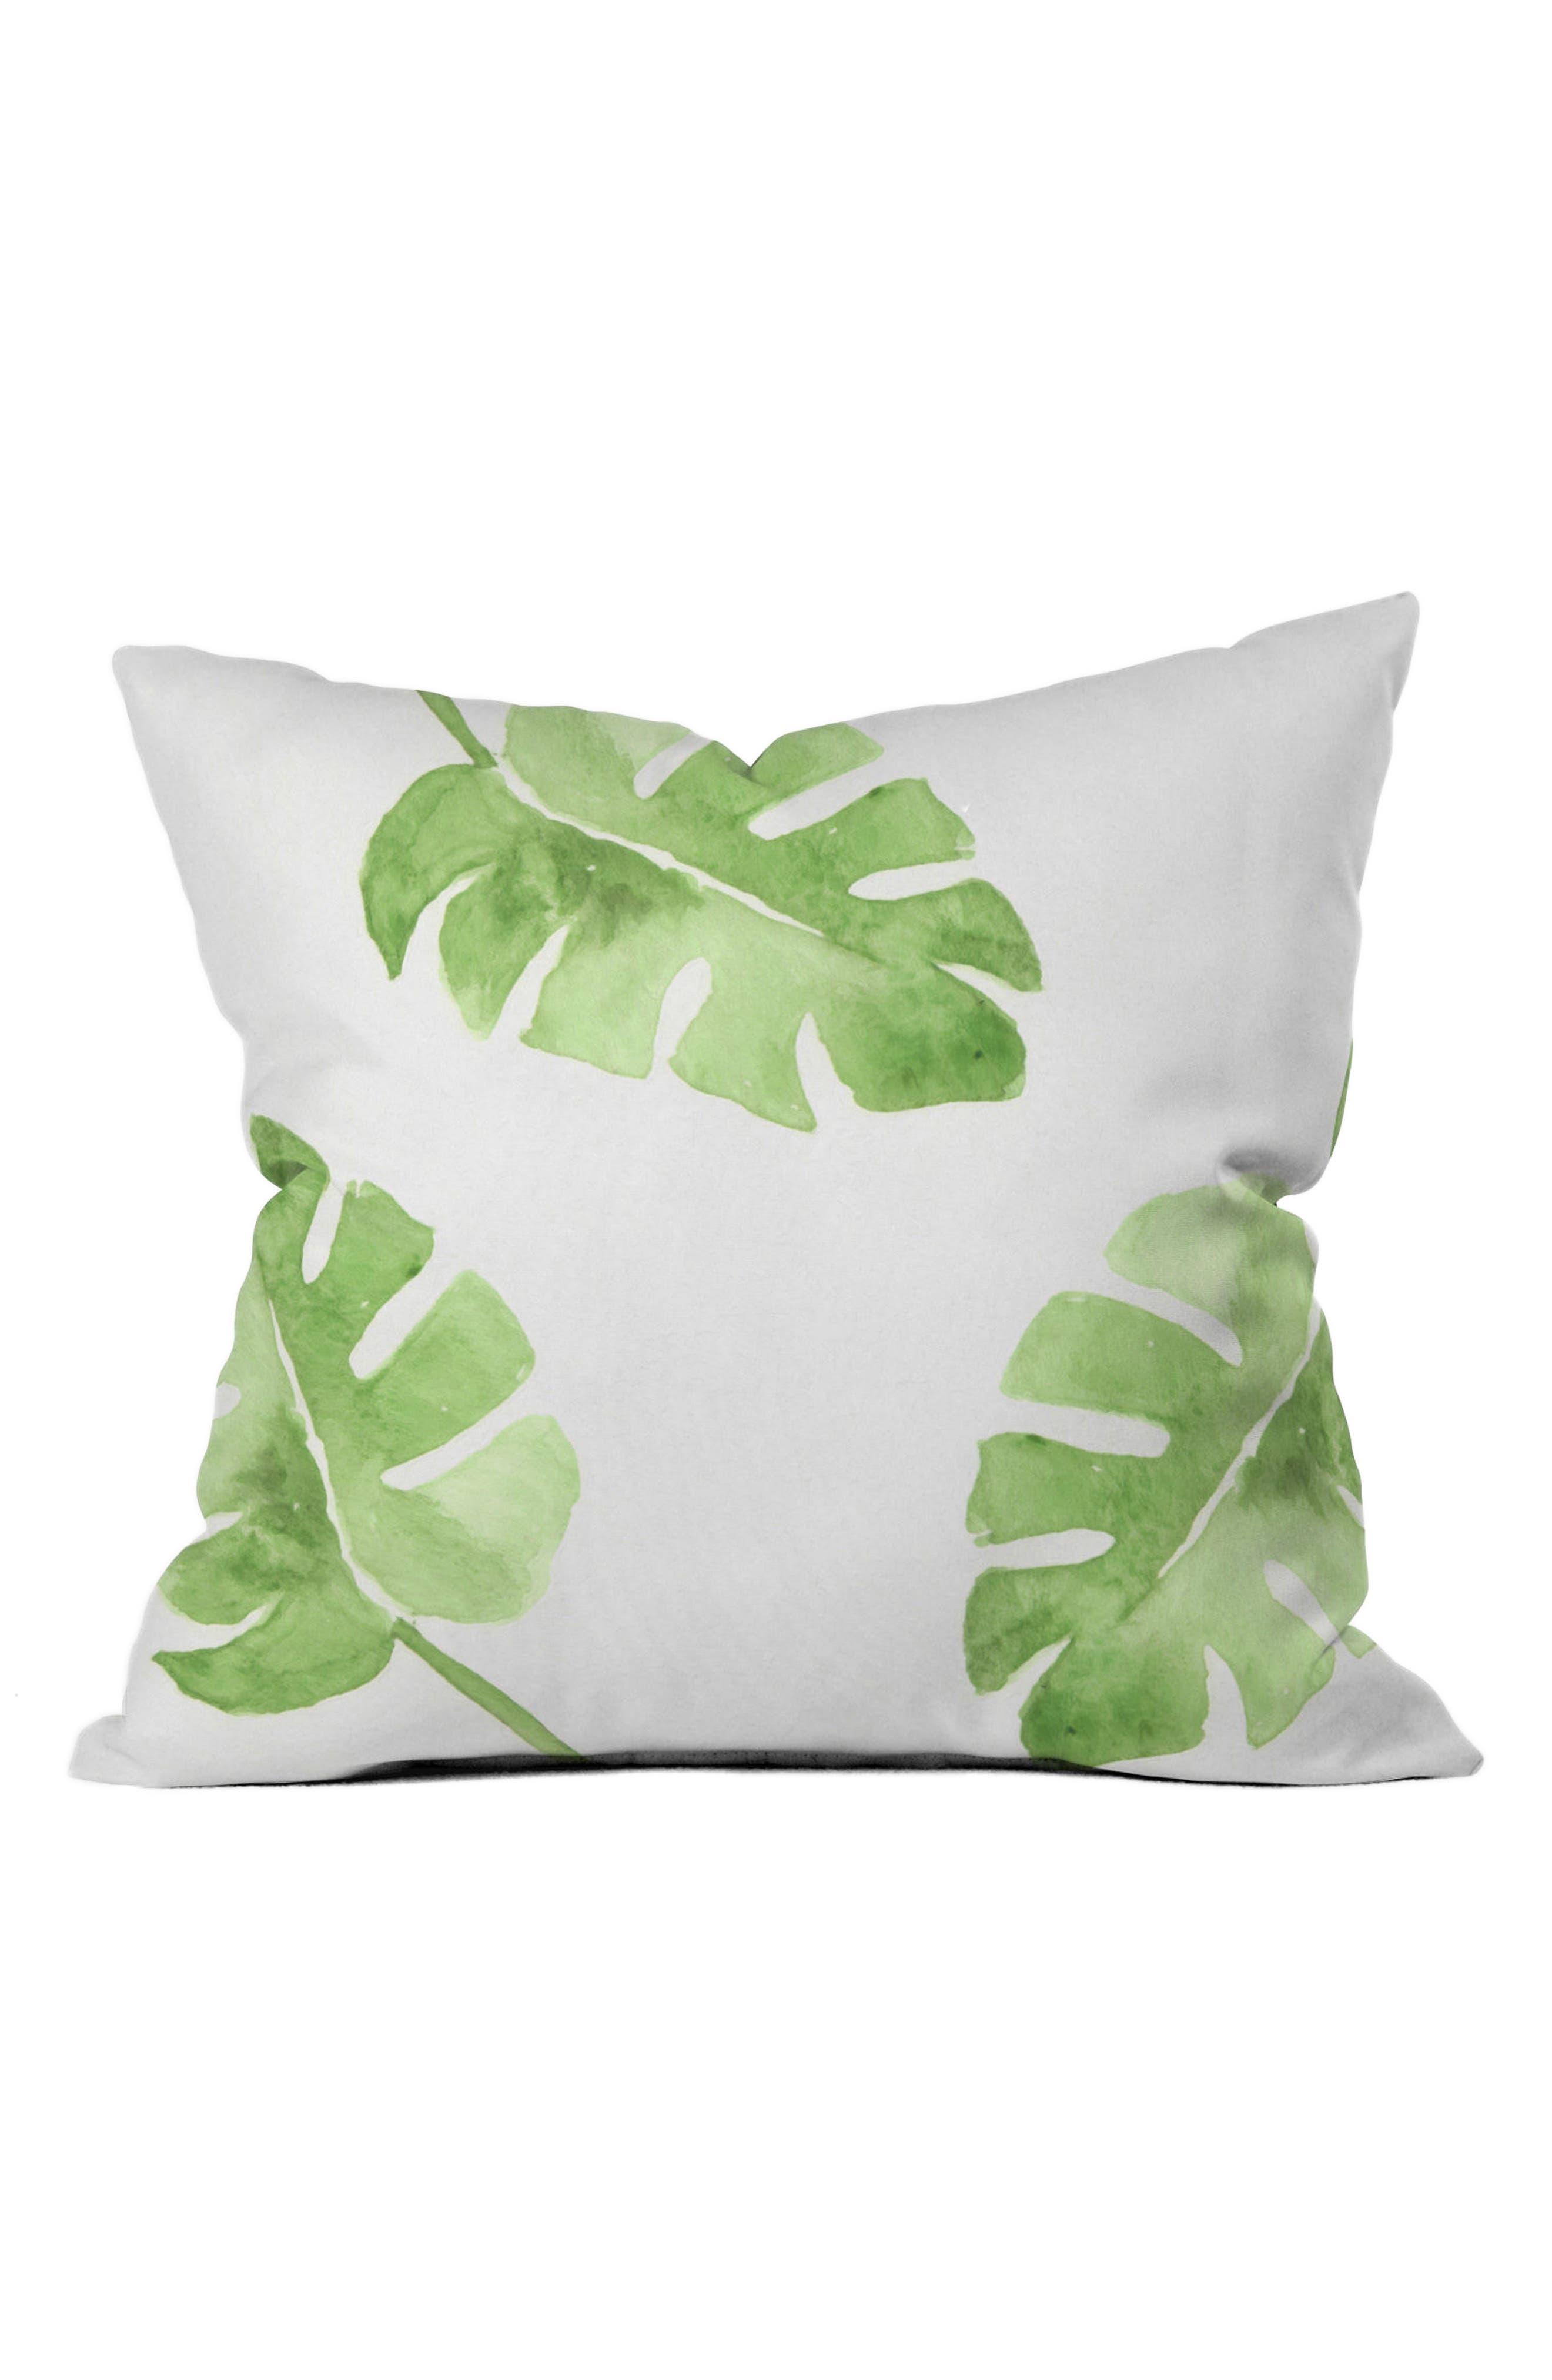 Wonder Forest Pillow,                             Main thumbnail 1, color,                             Green